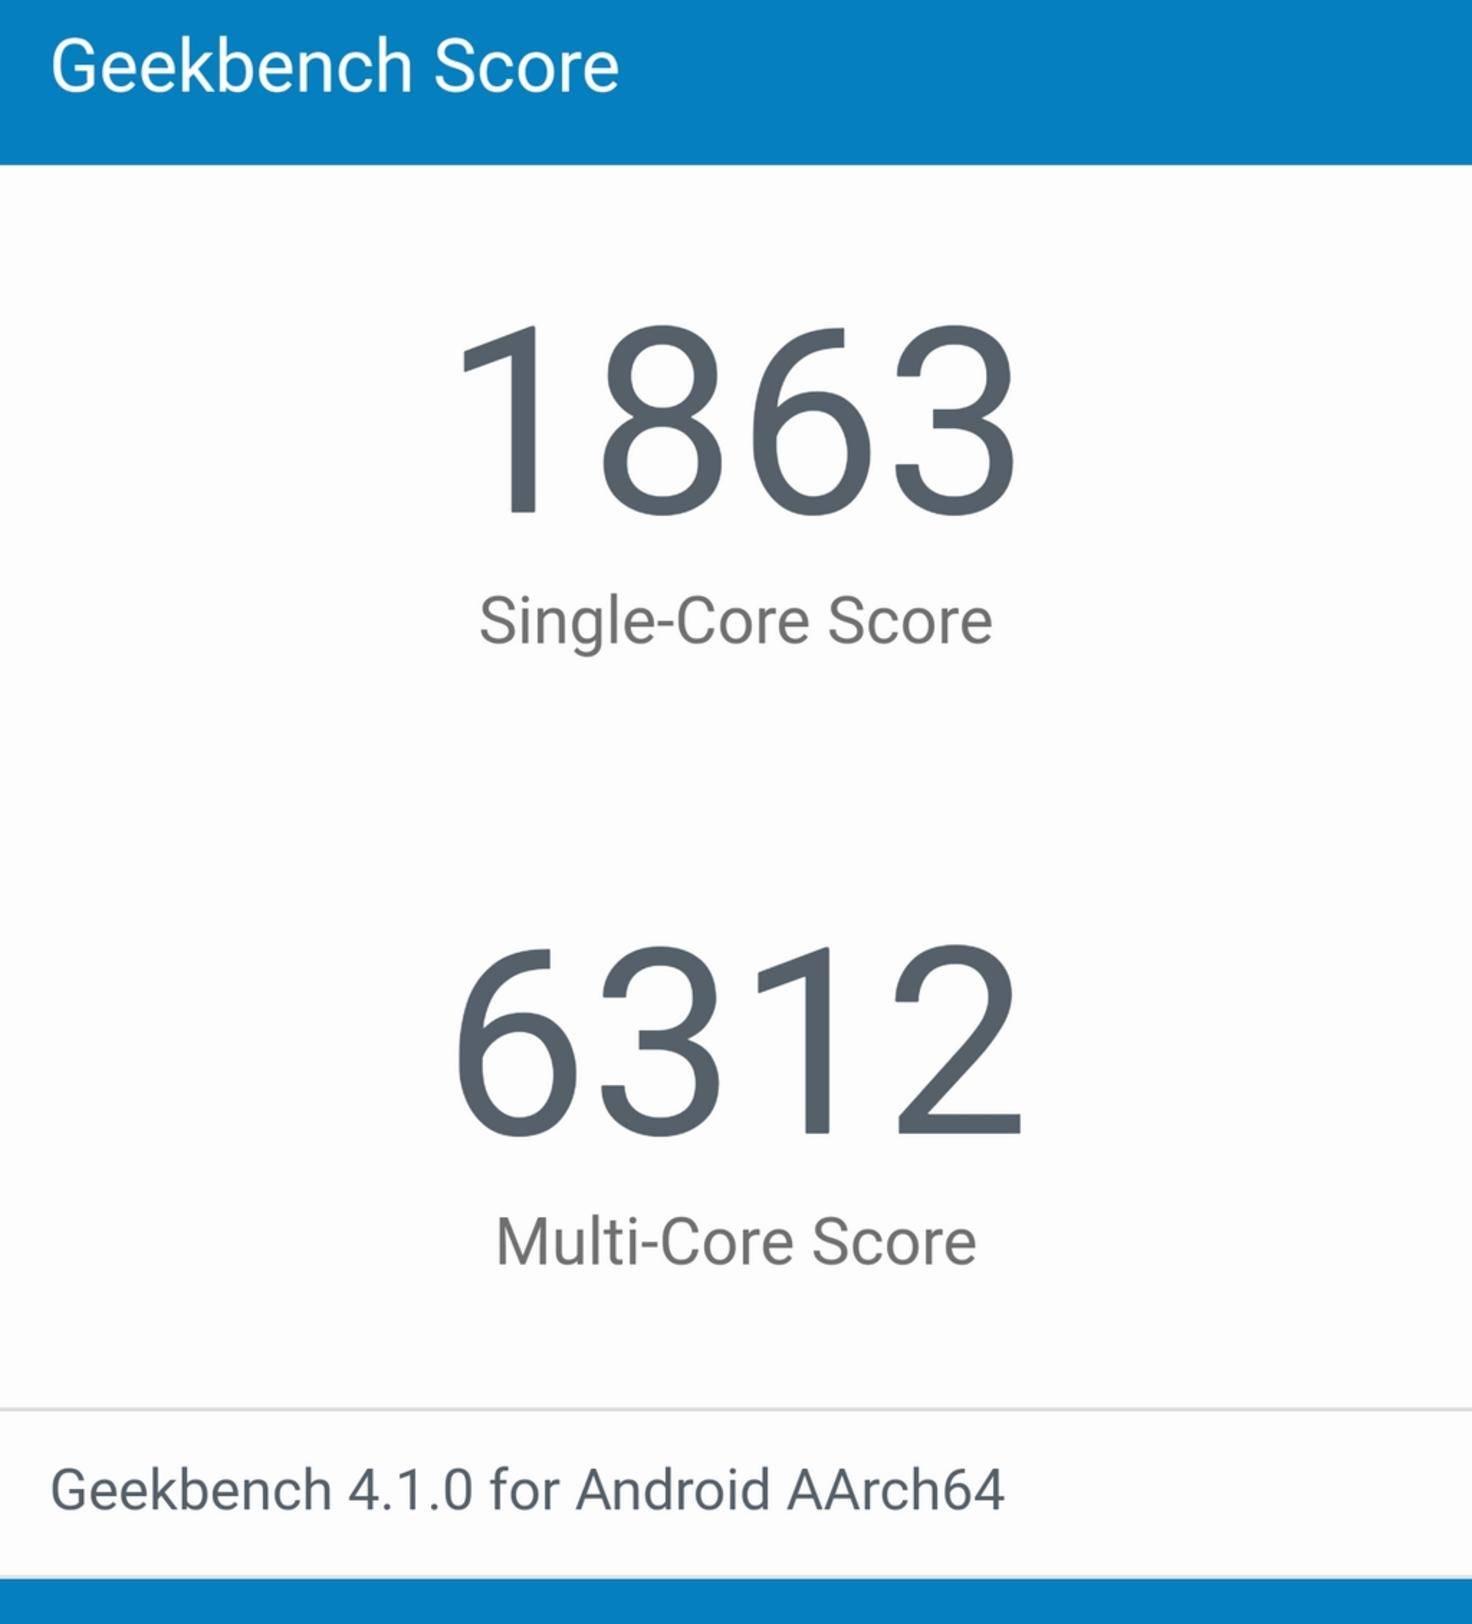 Geekbench Honor 8 Pro